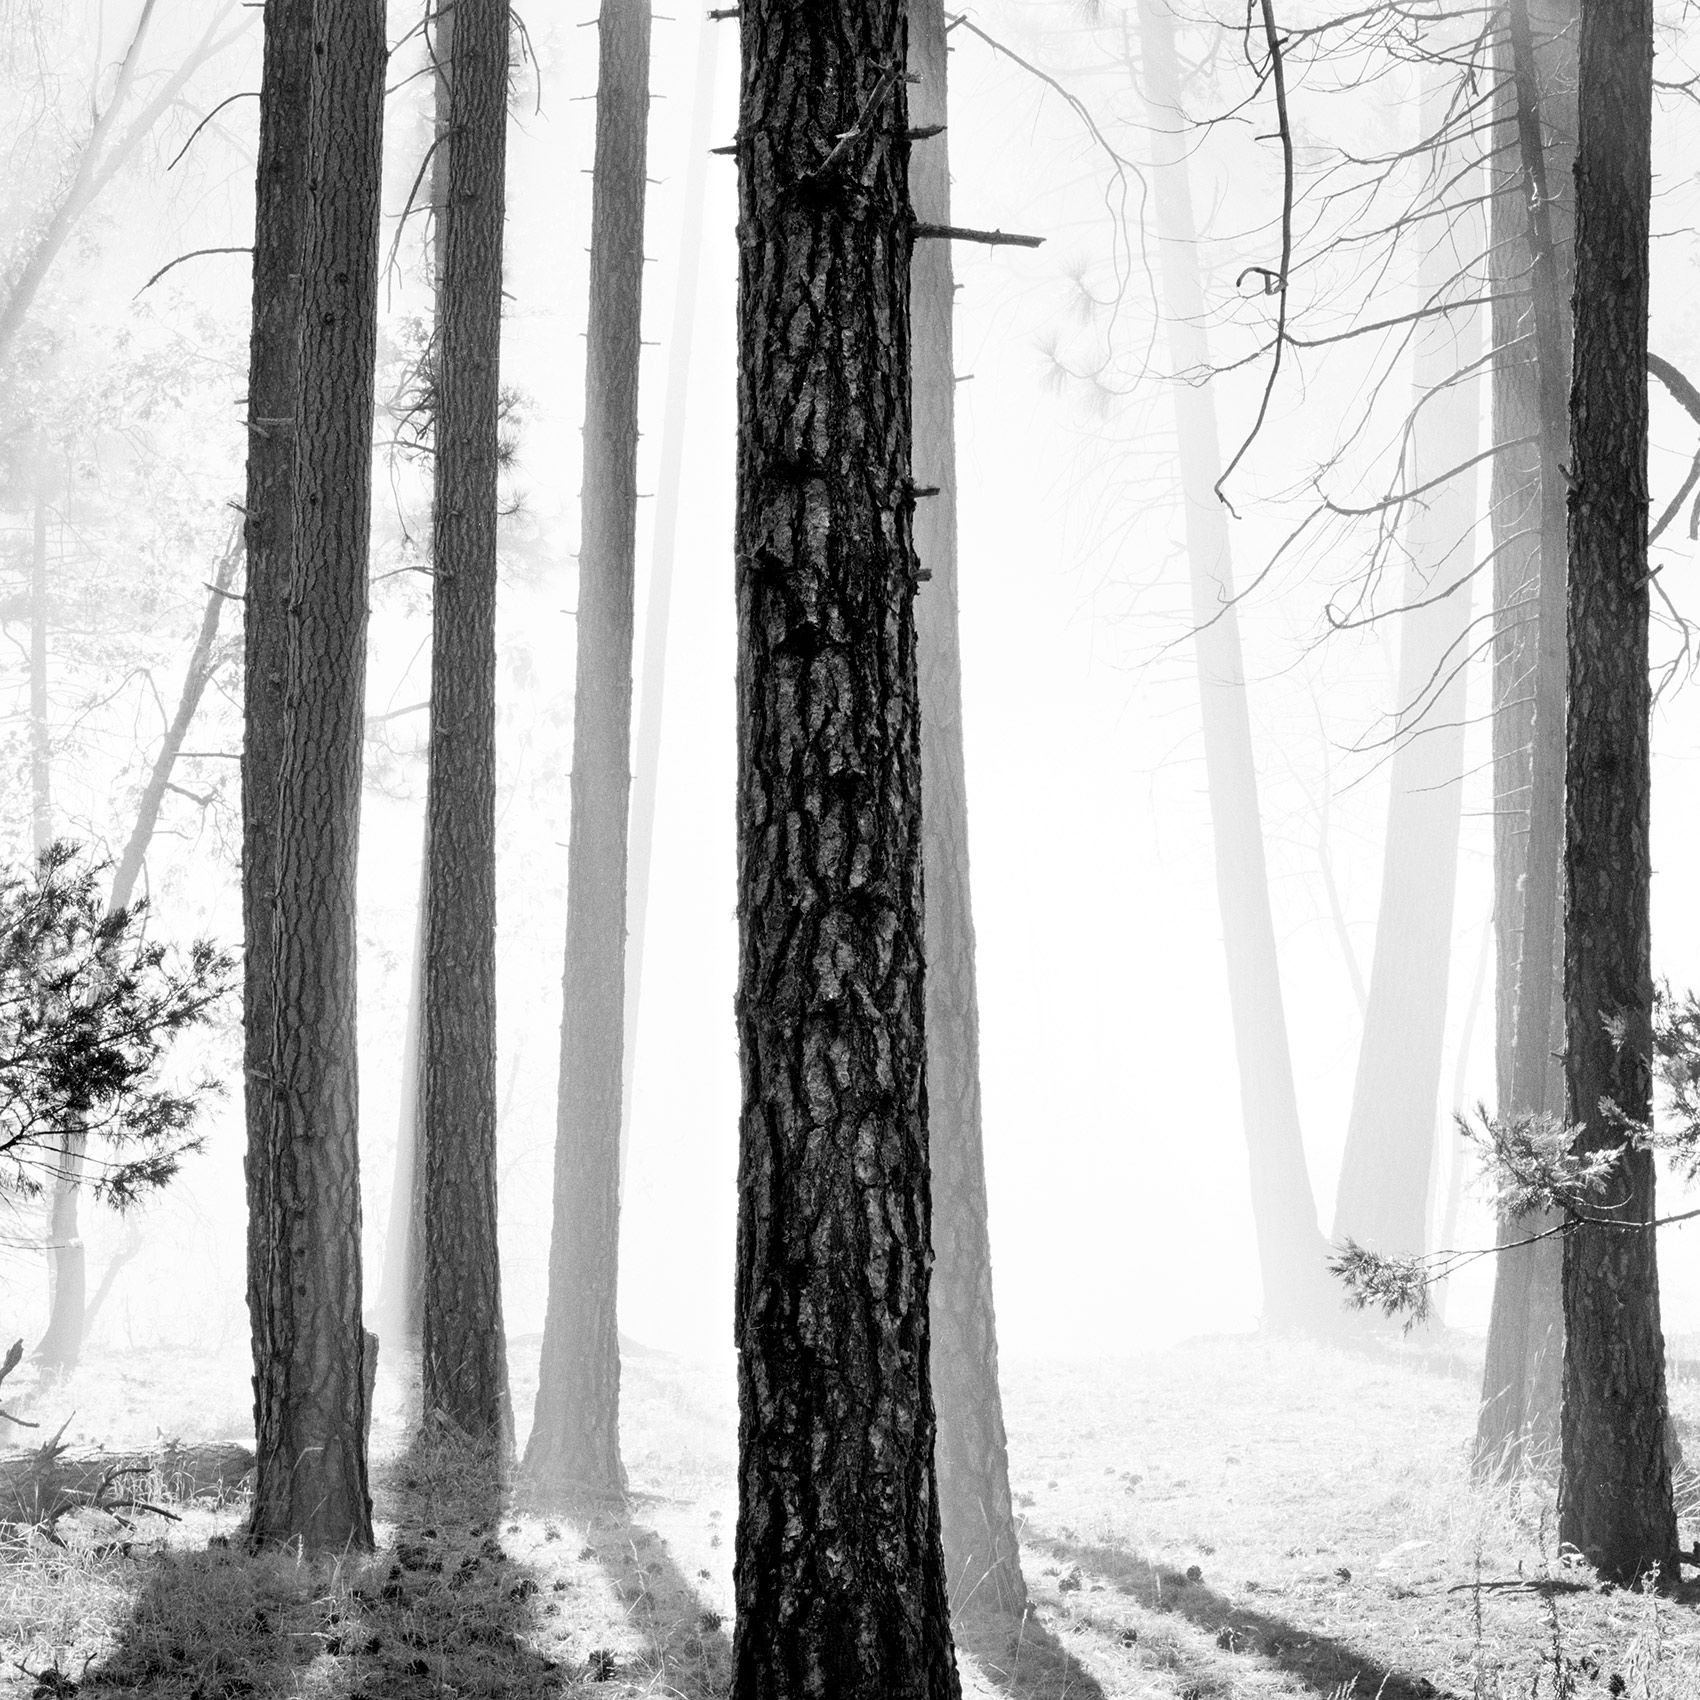 TreesinMorningFog_Yosemite.jpg